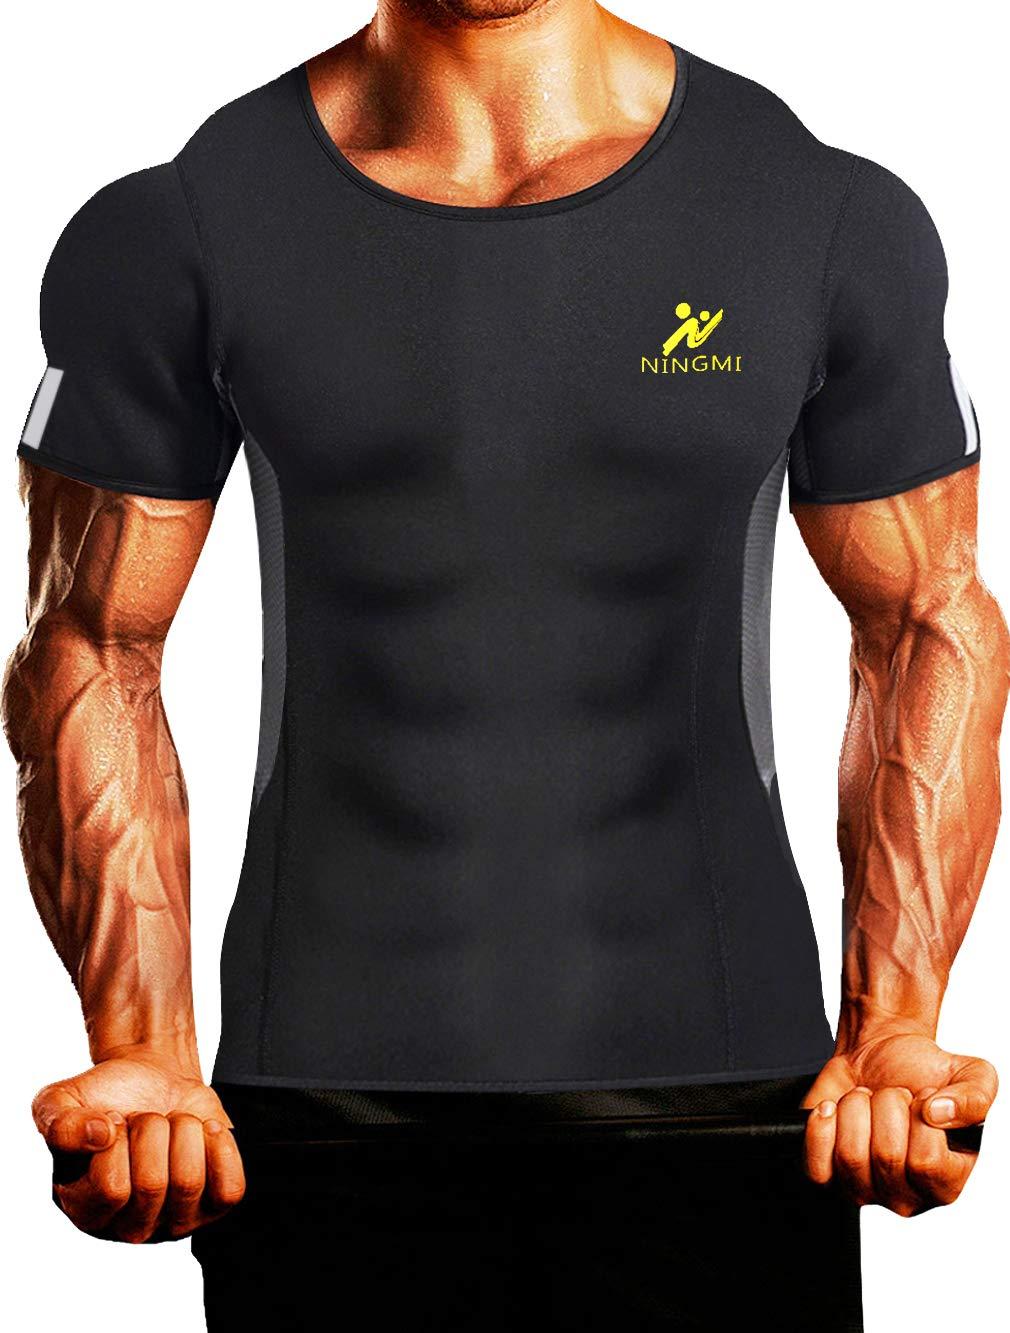 NINGMI Mens Waist Trainer Vest Hot Sweat Shirt Neoprene Sauna Suit Workout Body Shaper Cami for WeightLoss Tummy Fat Burner Black